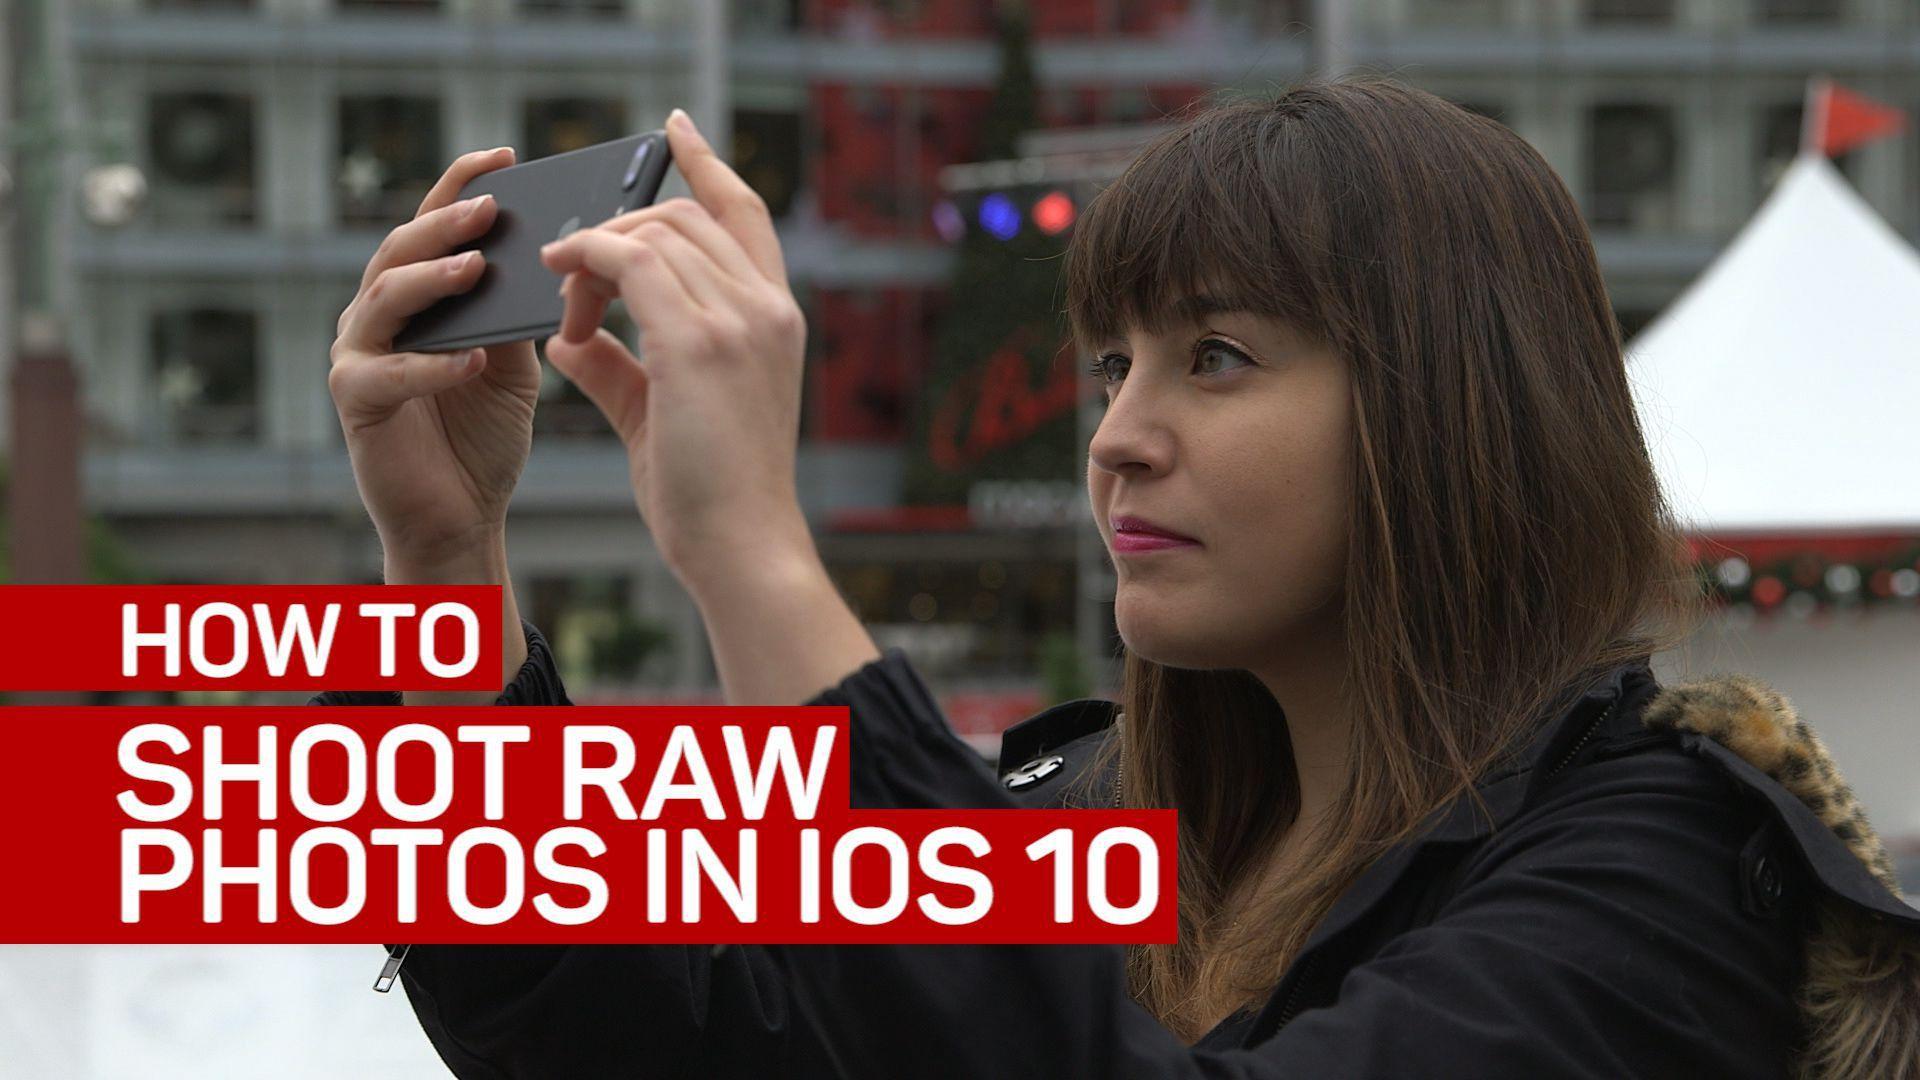 Shoot raw photos in iOS 10